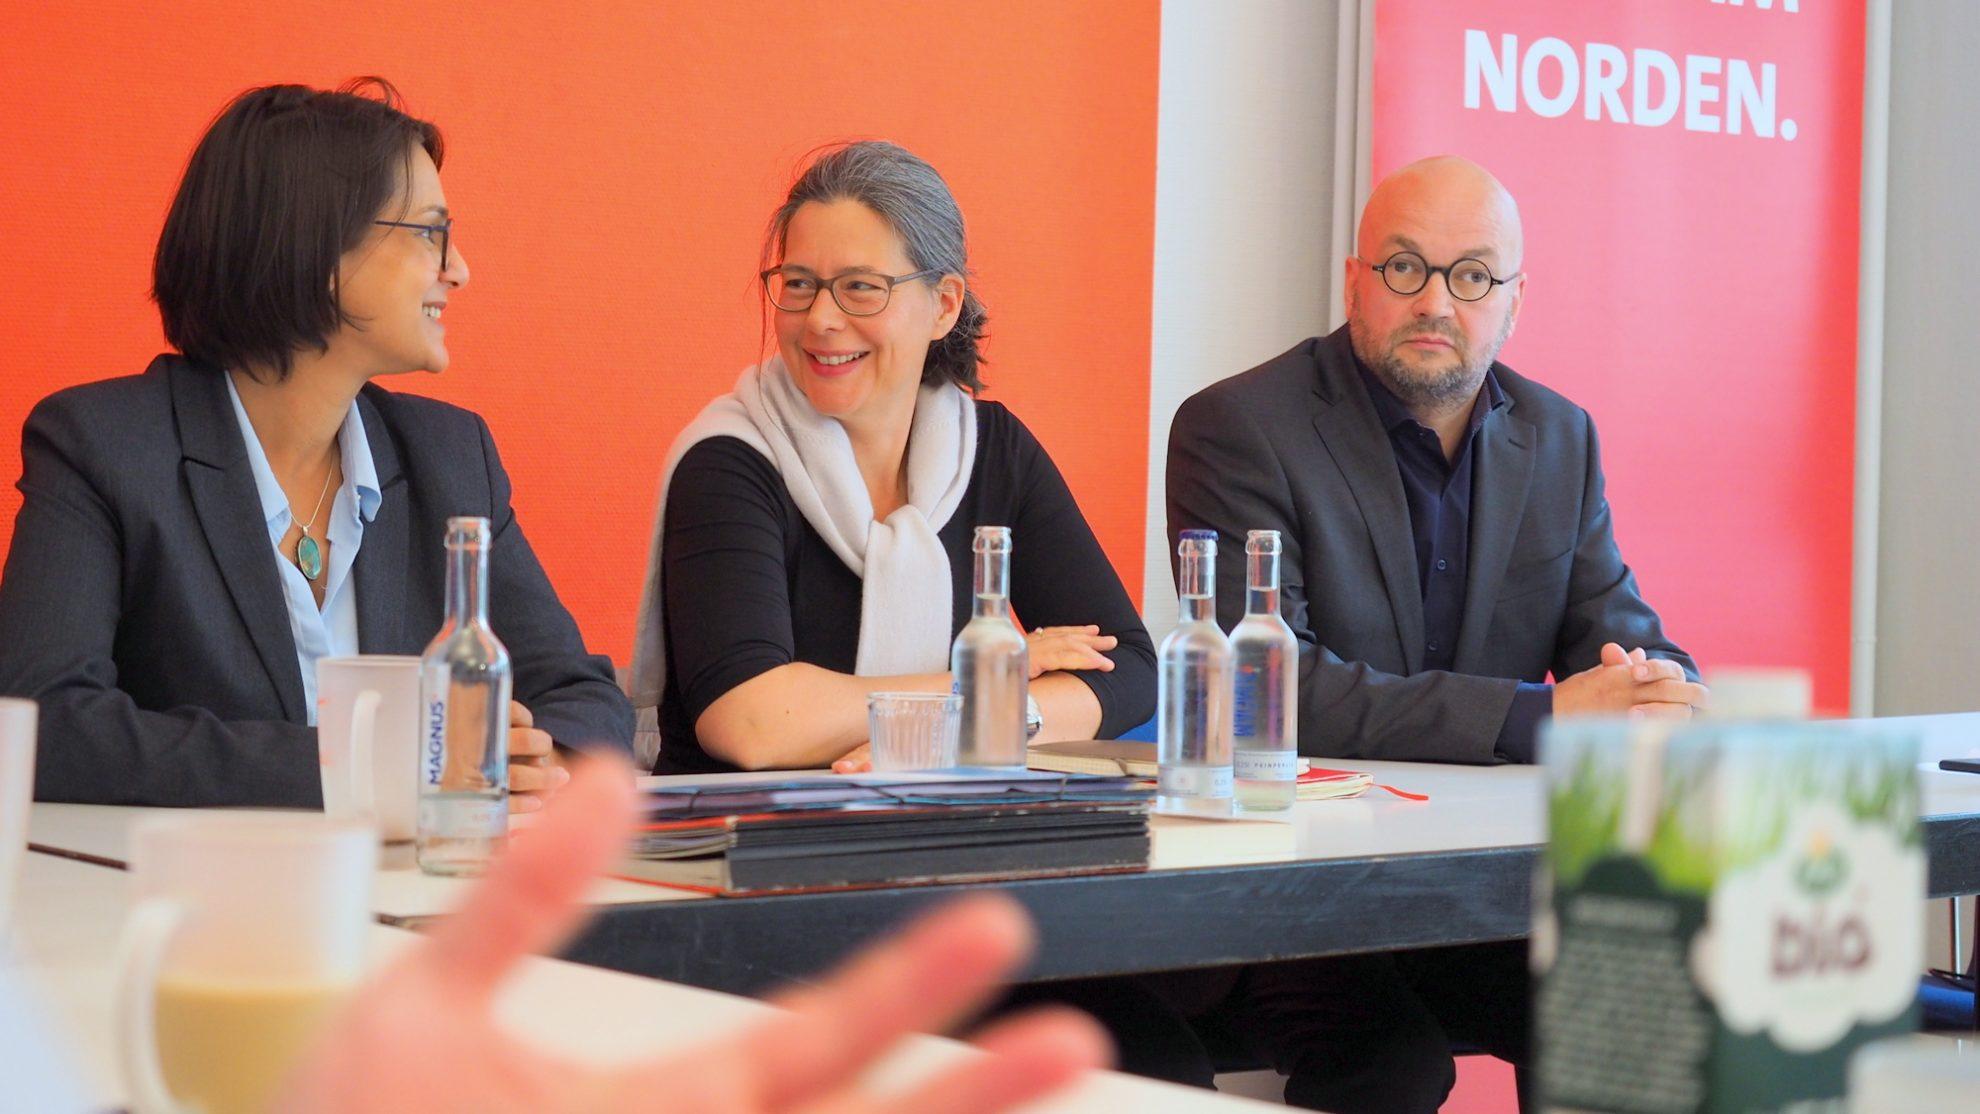 Serpil Midyatli, Nina Scheer, Marcus del Monte